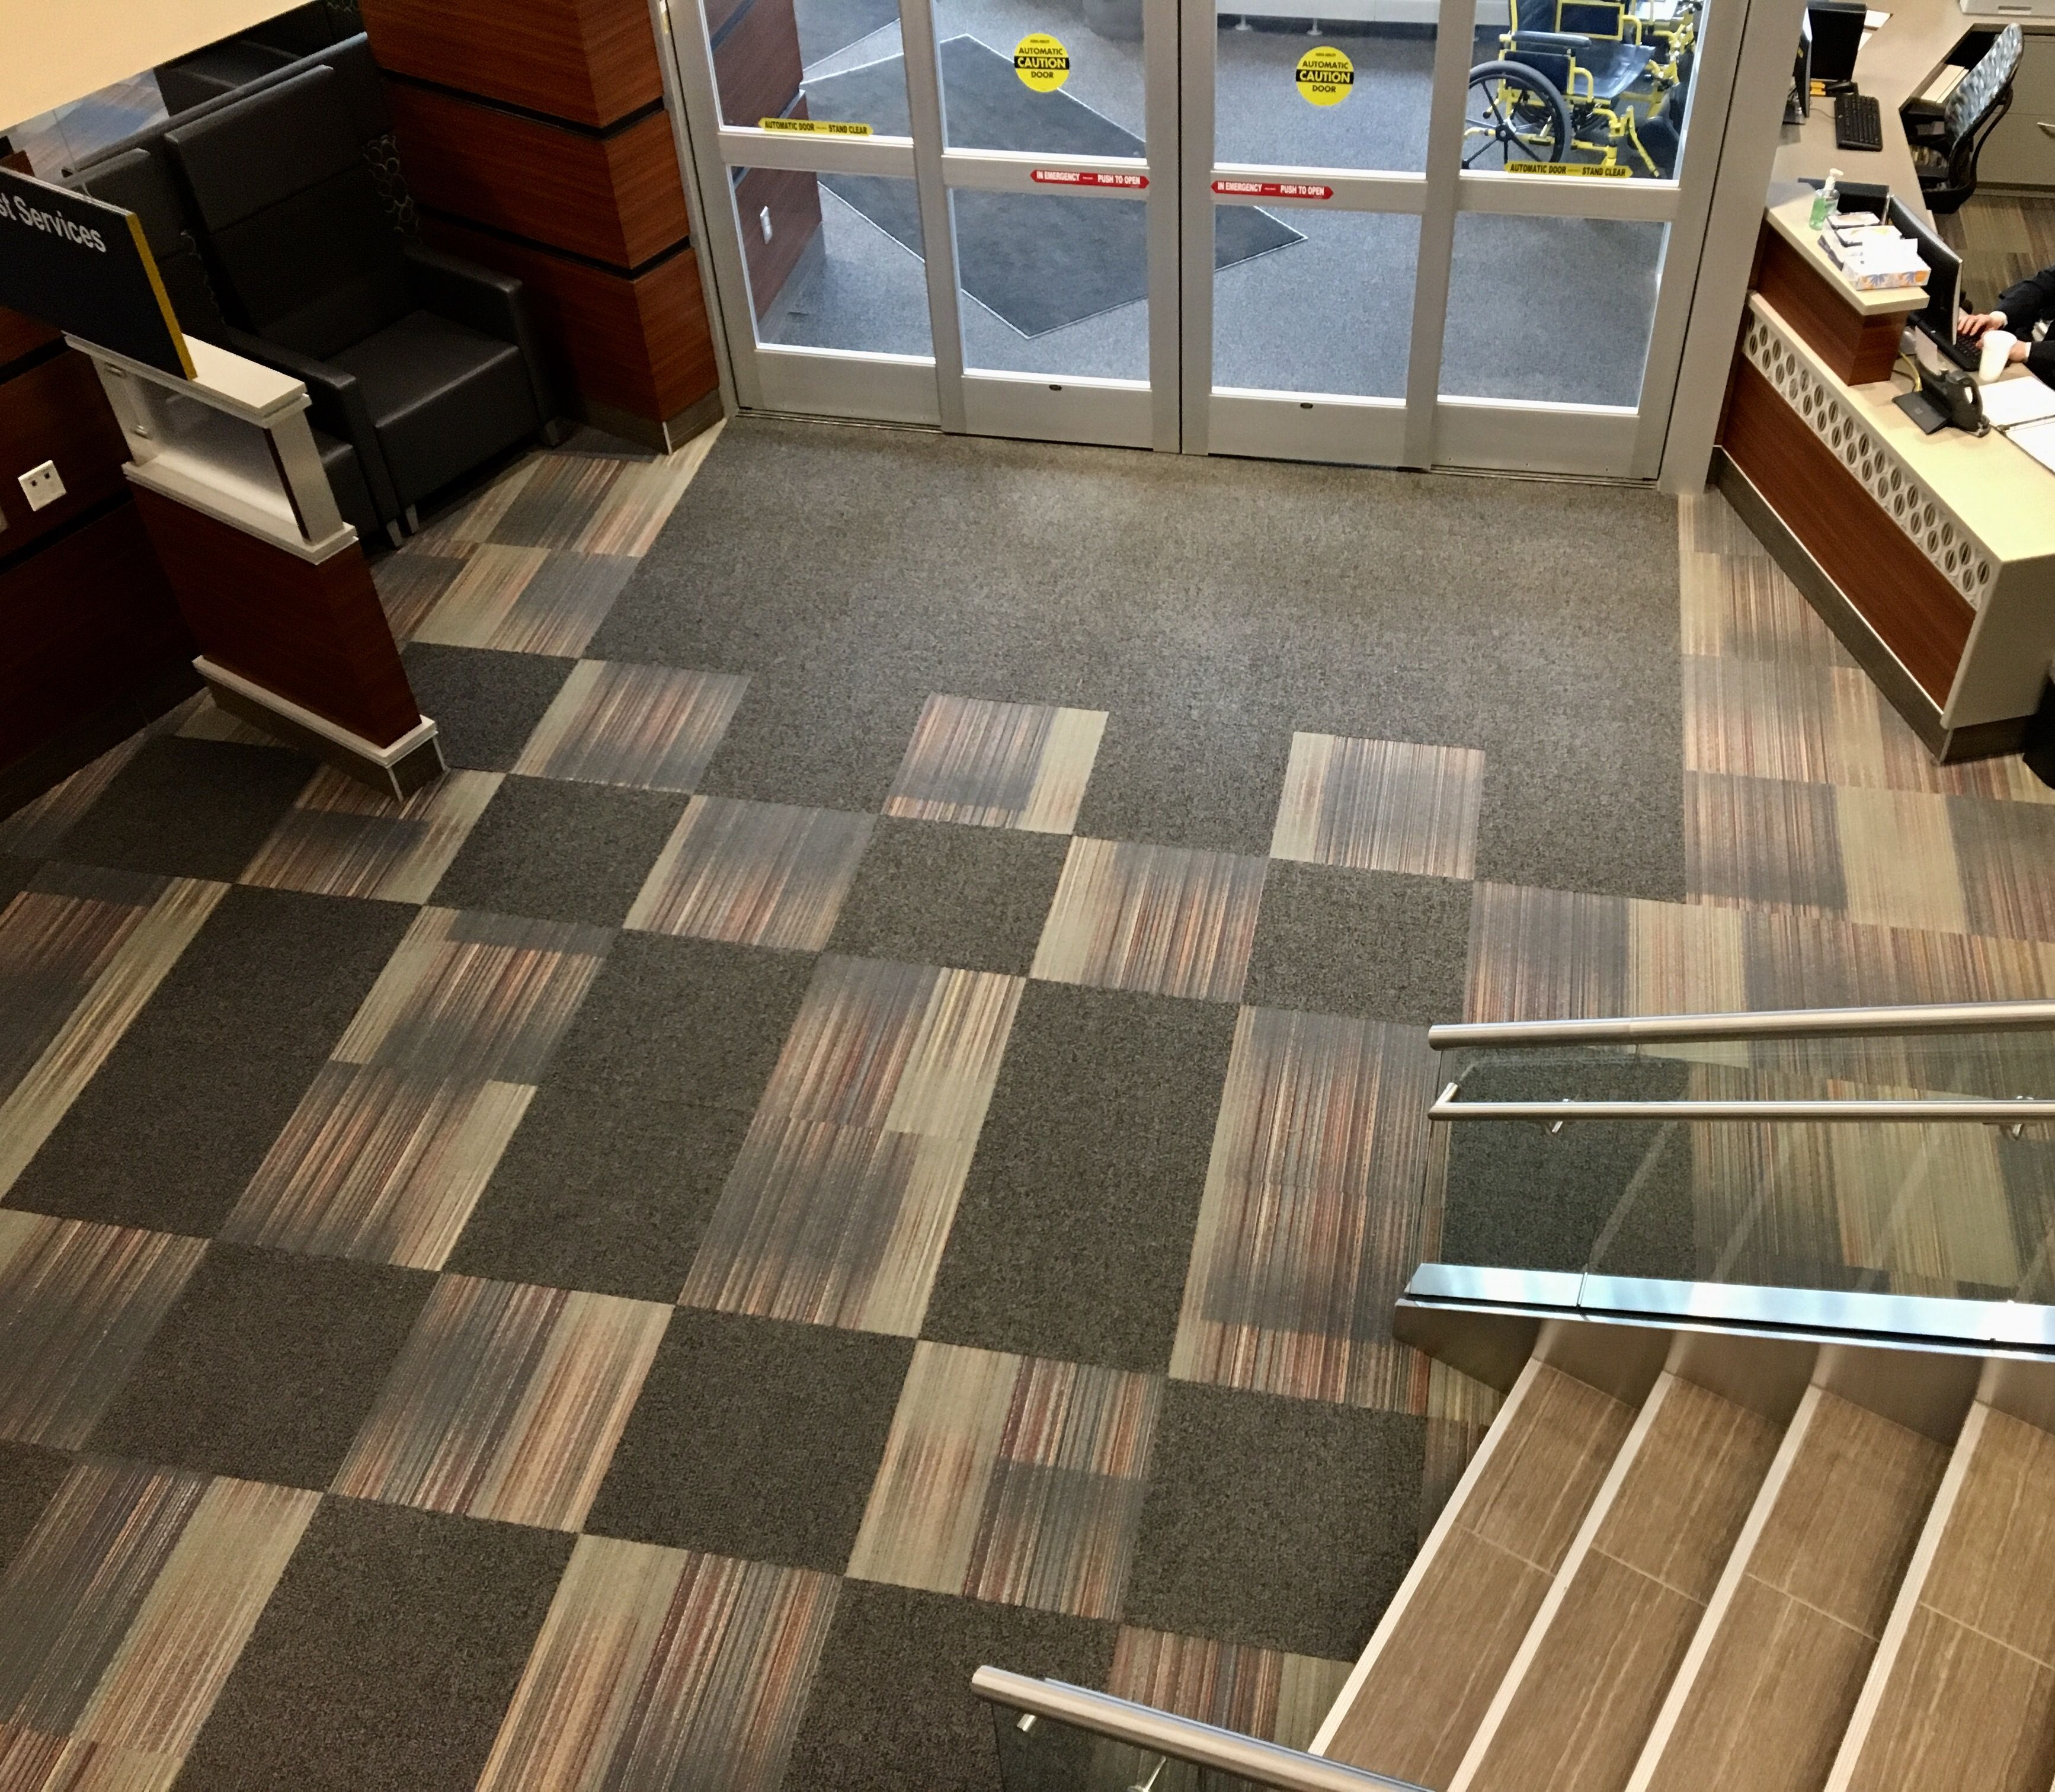 Access Walk Off Tiles 24 X 24 With Intermix 24 X 24 Carpet